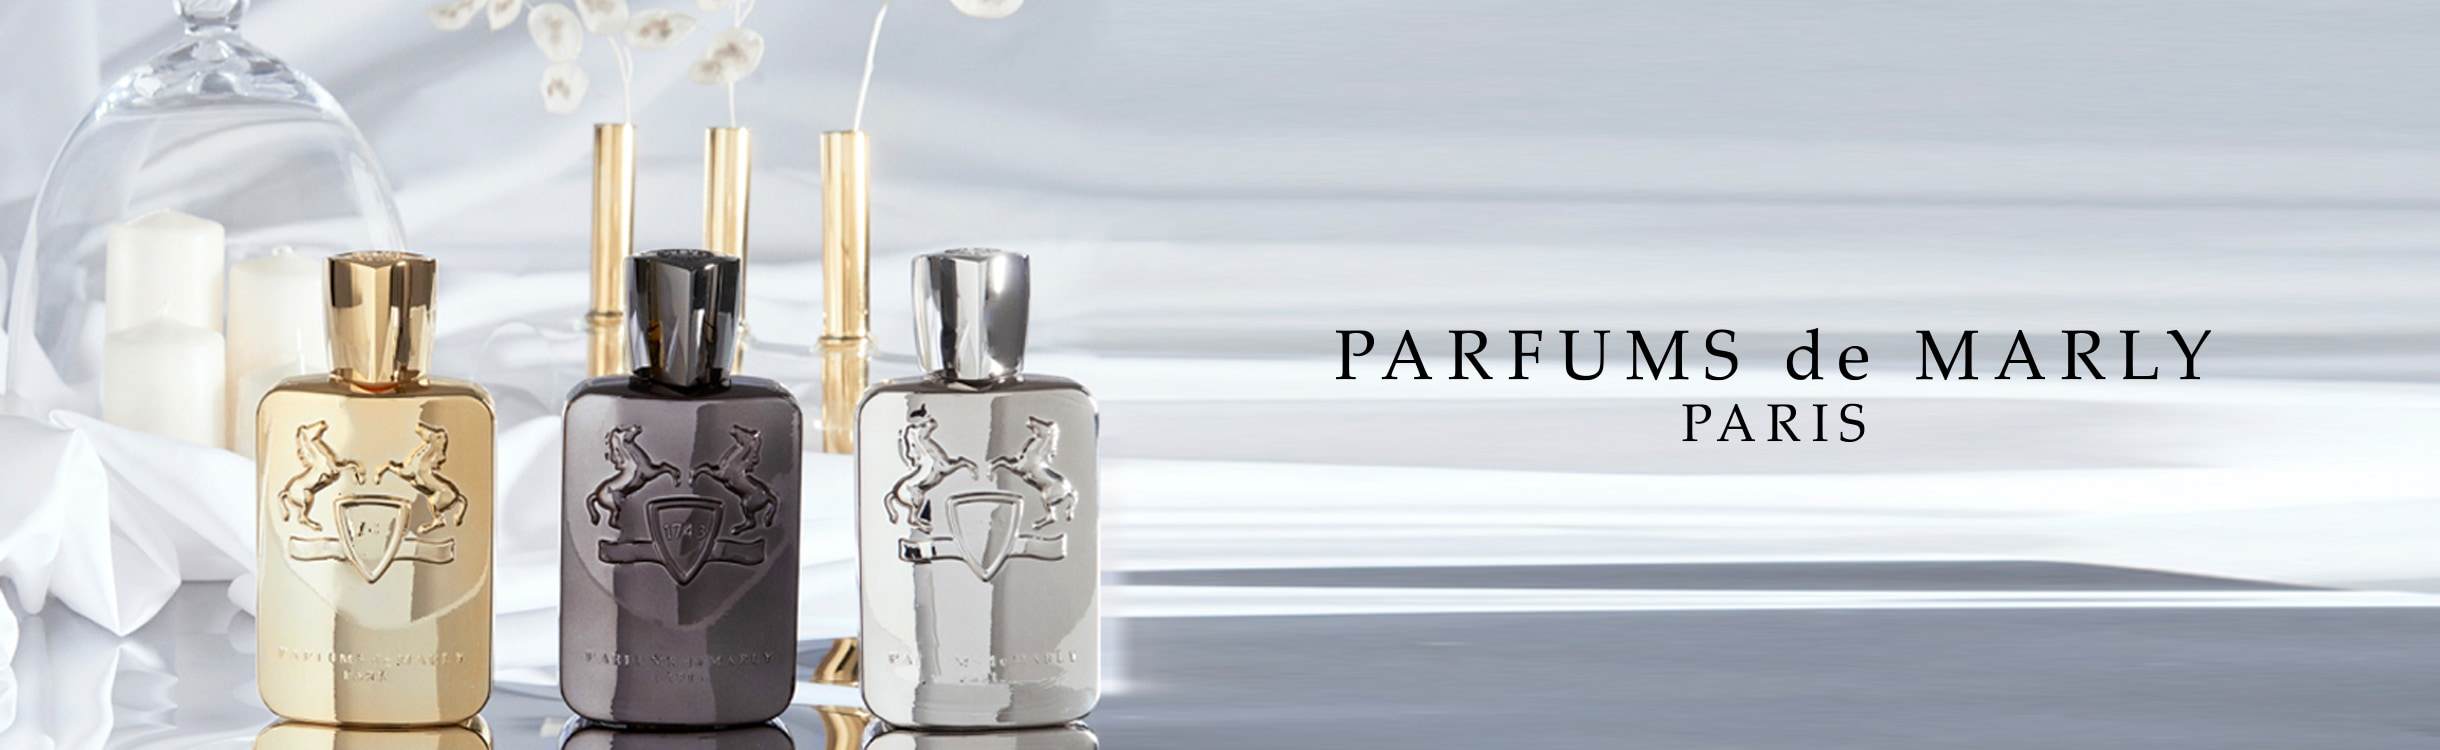 Perfumes Parfums de Marly Unissex